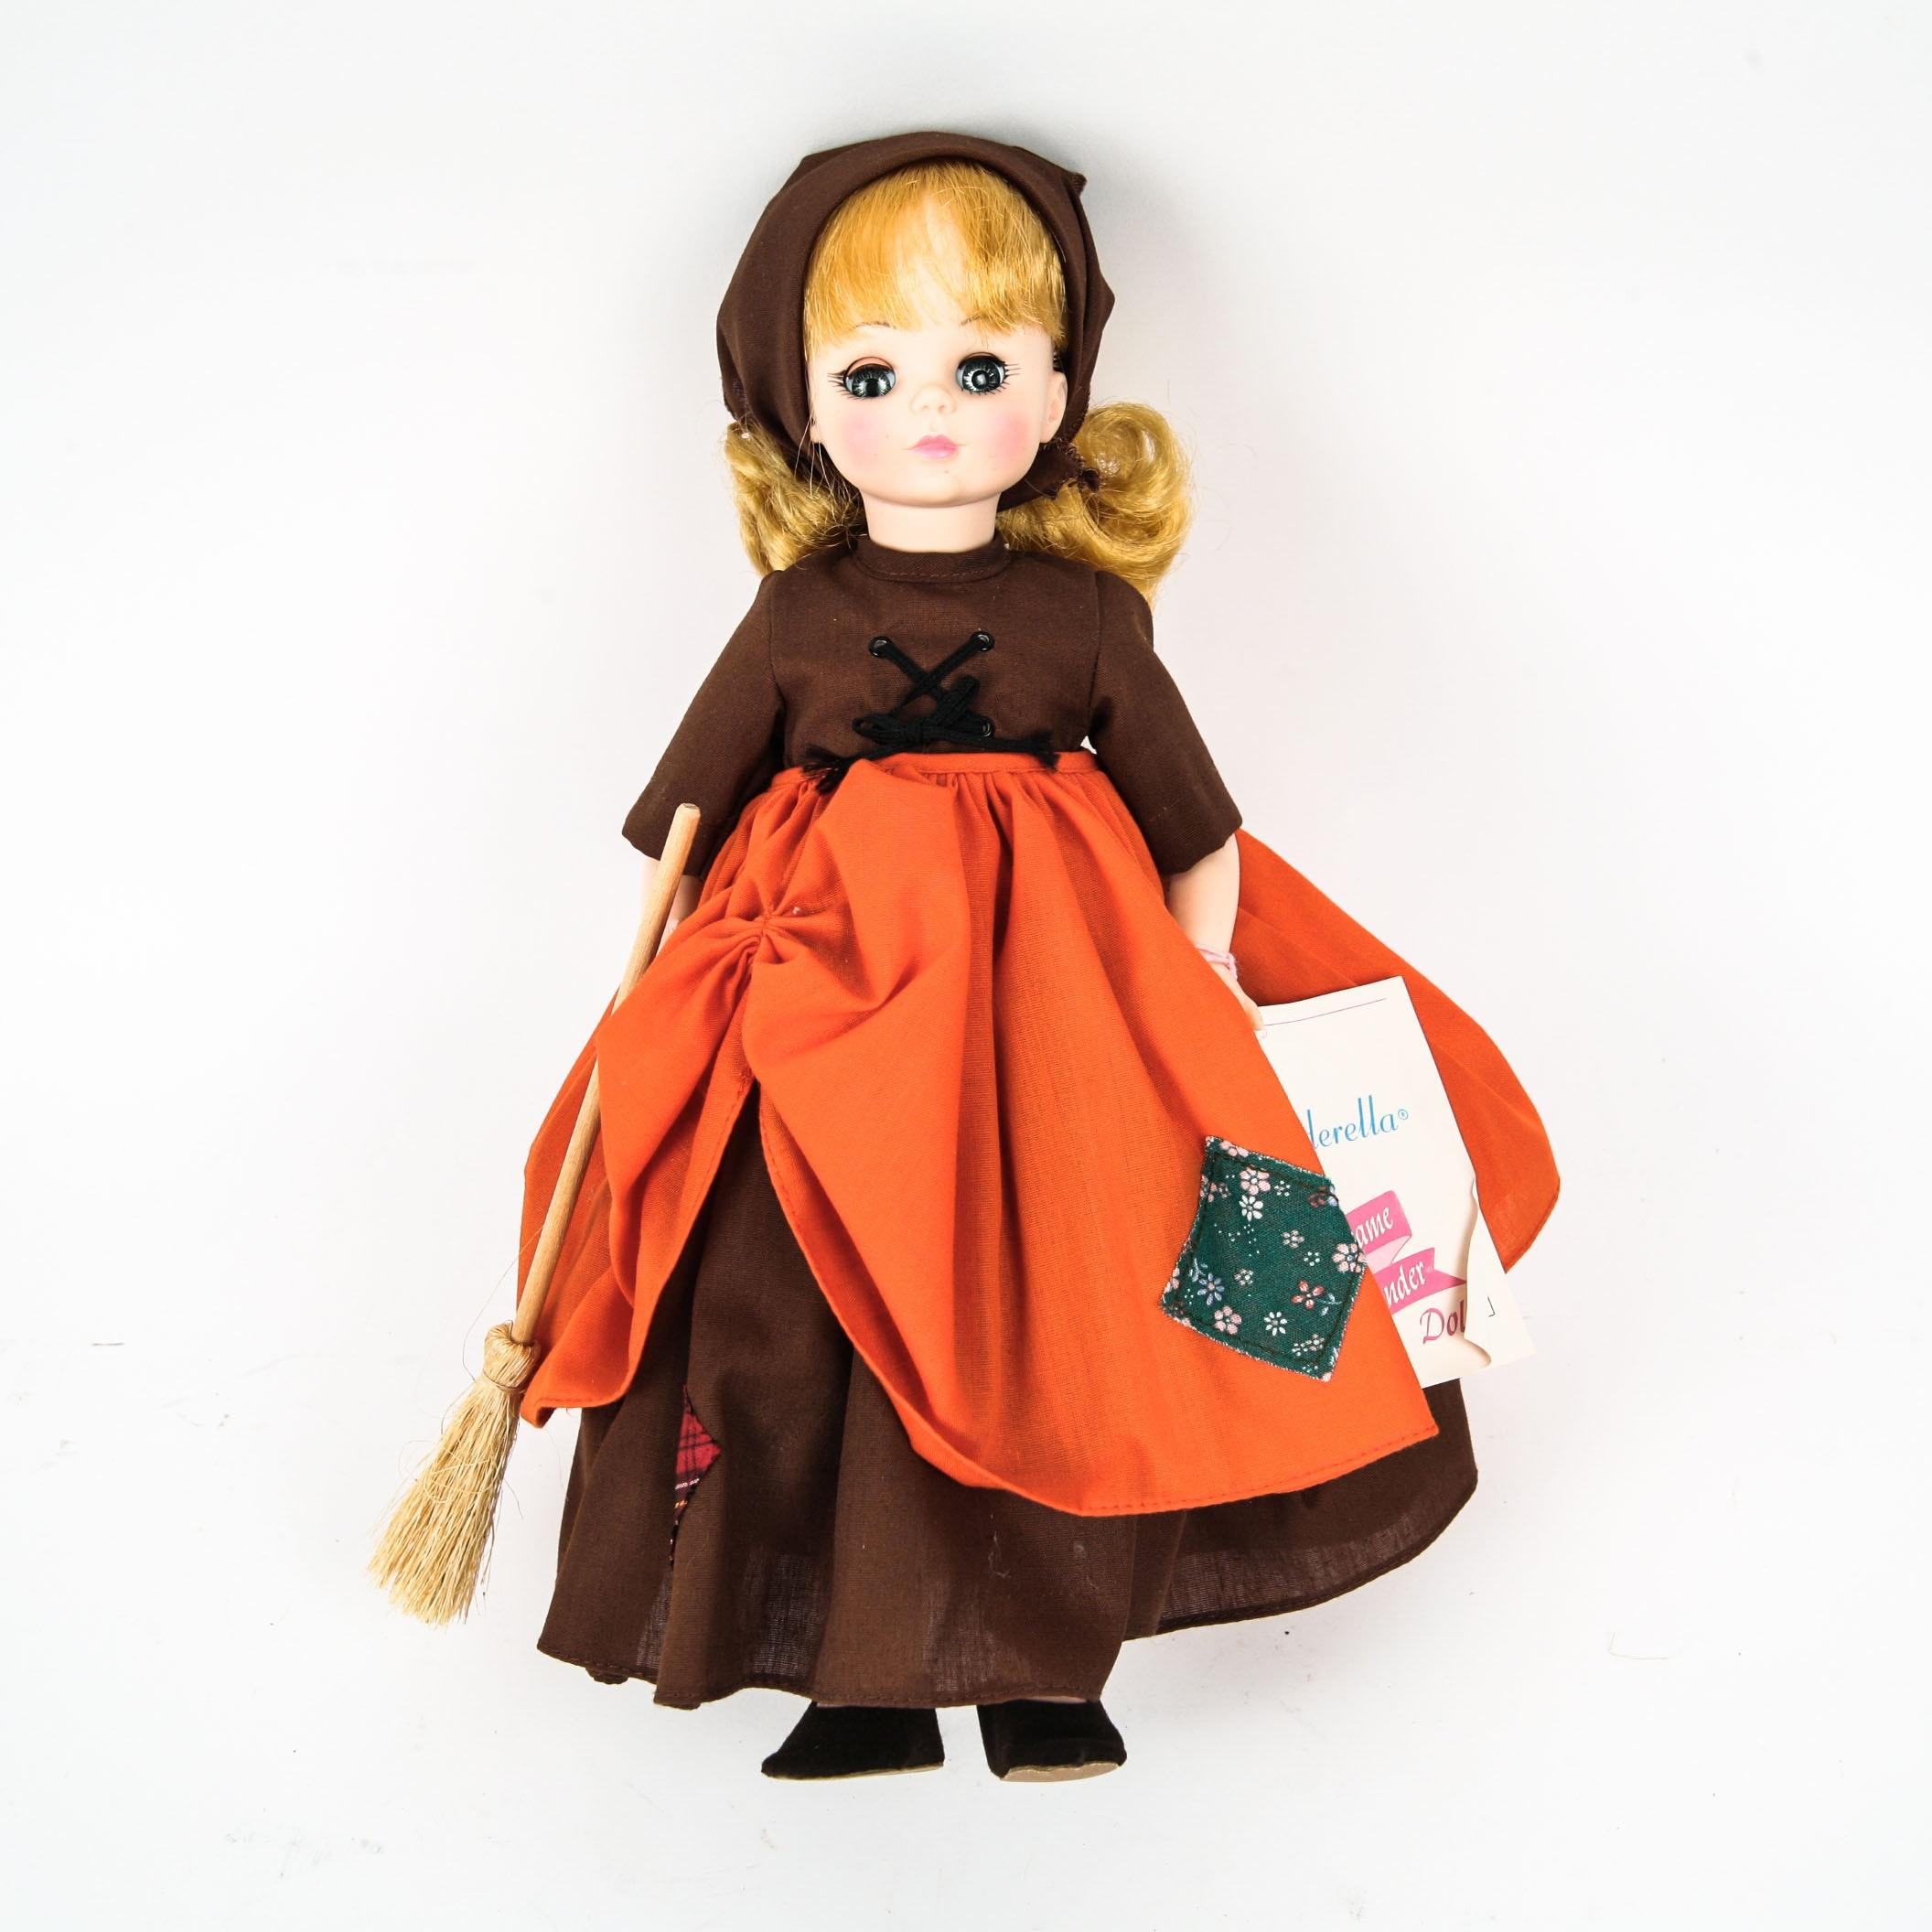 1965 Madame Alexander Poor Cinderella Doll ...  sc 1 st  EBTH.com & 1965 Madame Alexander Poor Cinderella Doll : EBTH